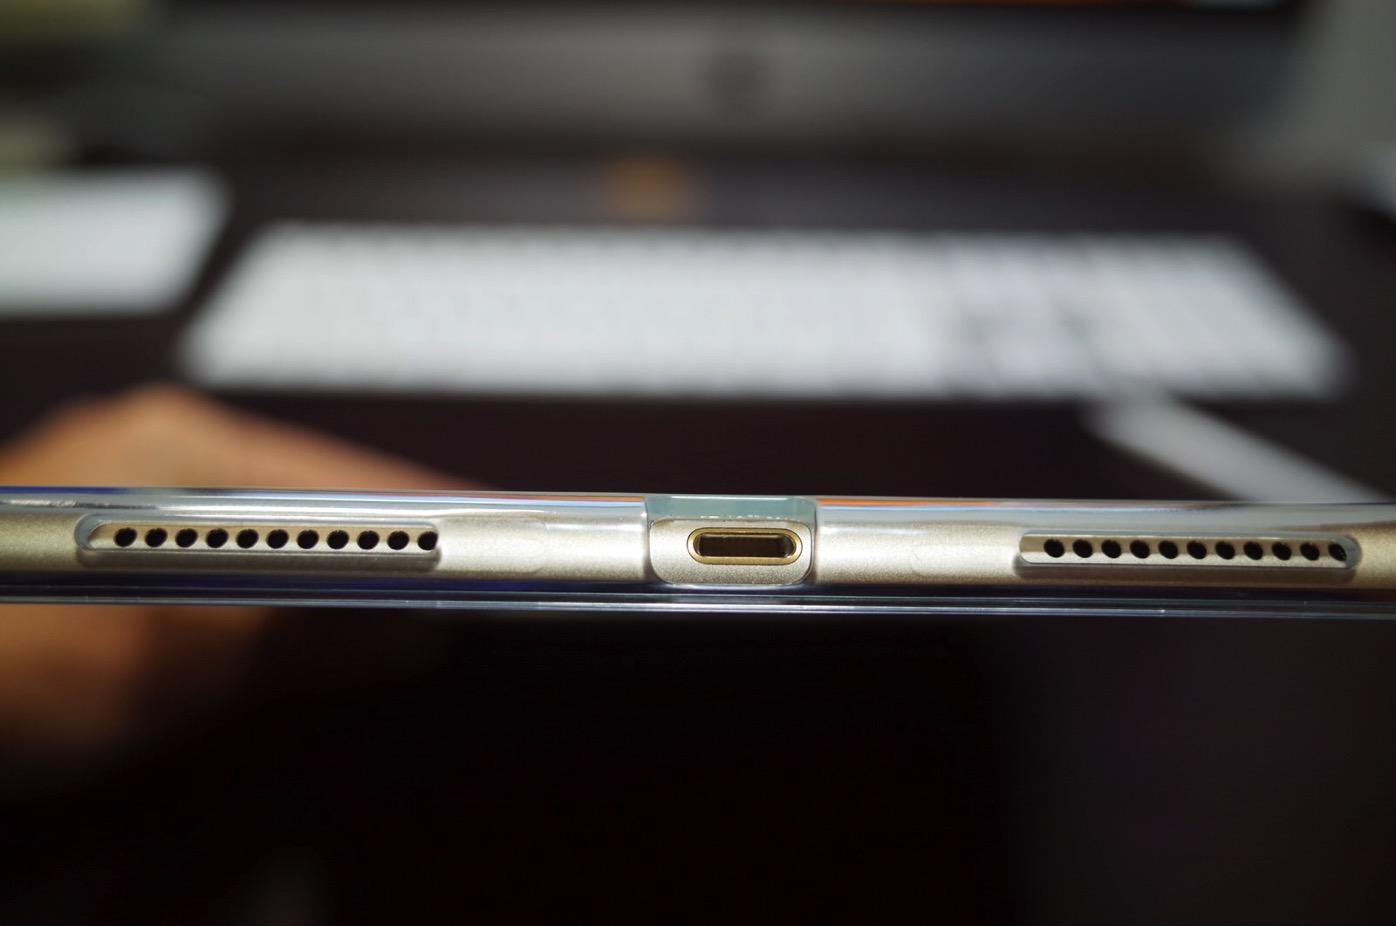 iPad Pro 10.5 ケース Poetic -[Lumos Series]- アップル 10.5型 アイパッド プロ 対応 [ウルトラスリム] [TPU製 ケース] Smart Keyboard 対応 Apple Pencil 収納スロット付き (クリスタルクリア)-11